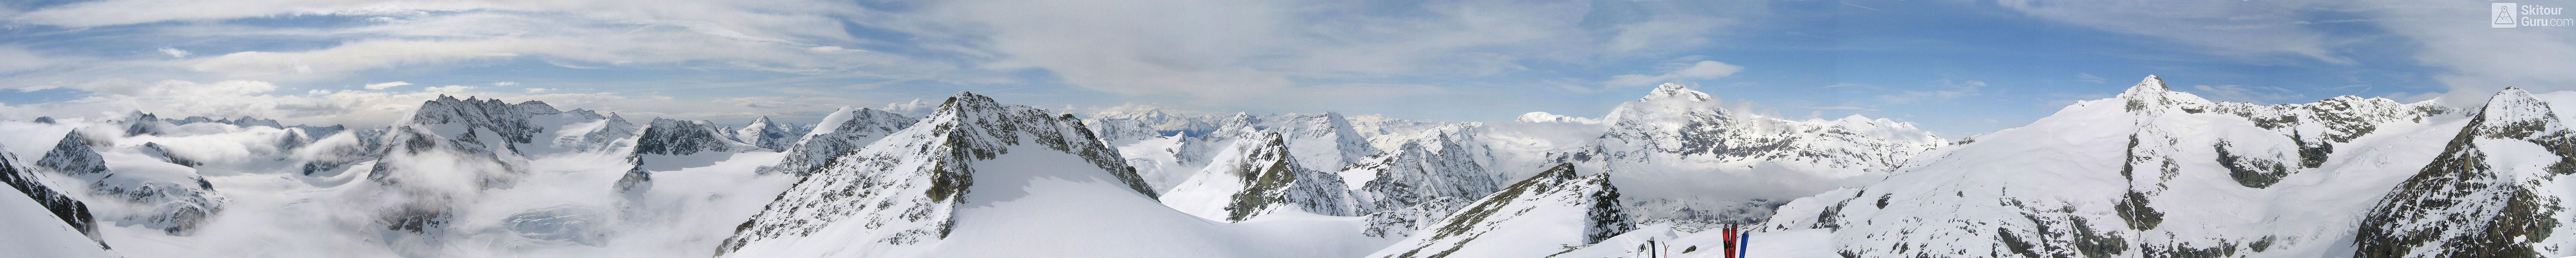 La Ruinette Walliser Alpen / Alpes valaisannes Schweiz panorama 06